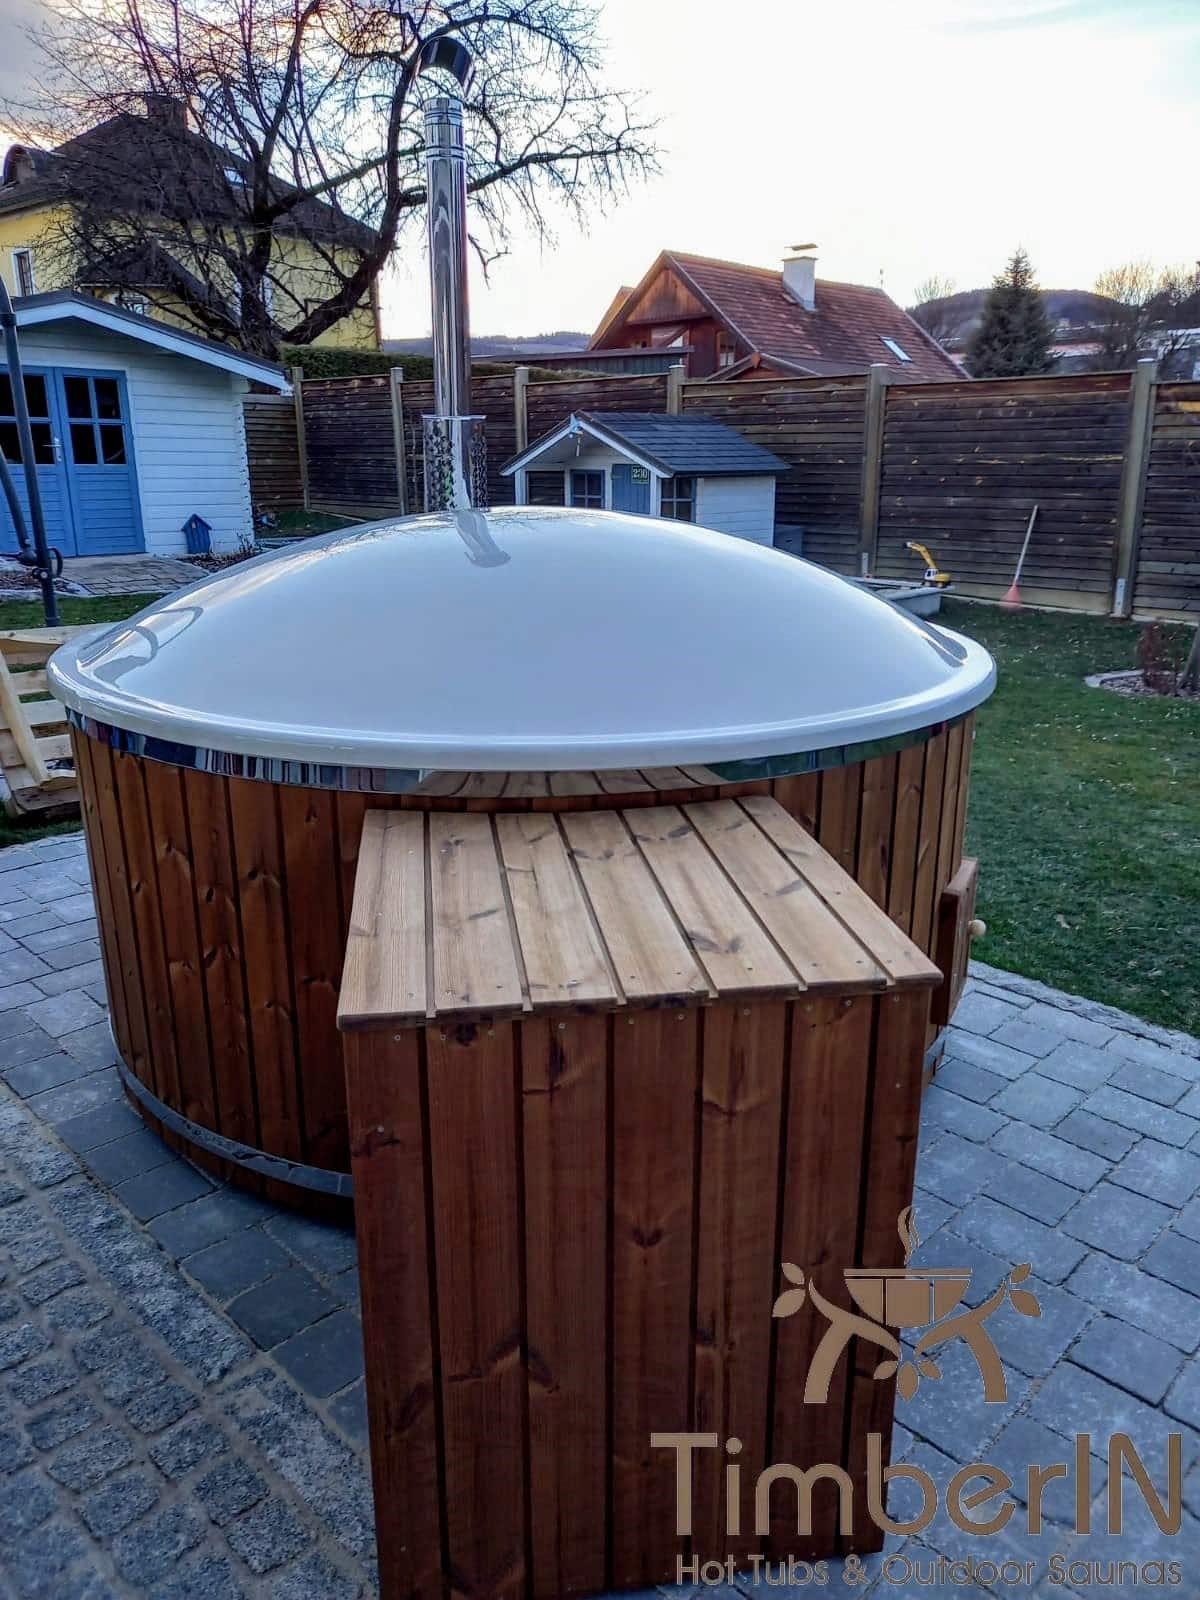 Badetonne Badebottich Hot Tube GFK mit Whirlpoolfunktion 2 1